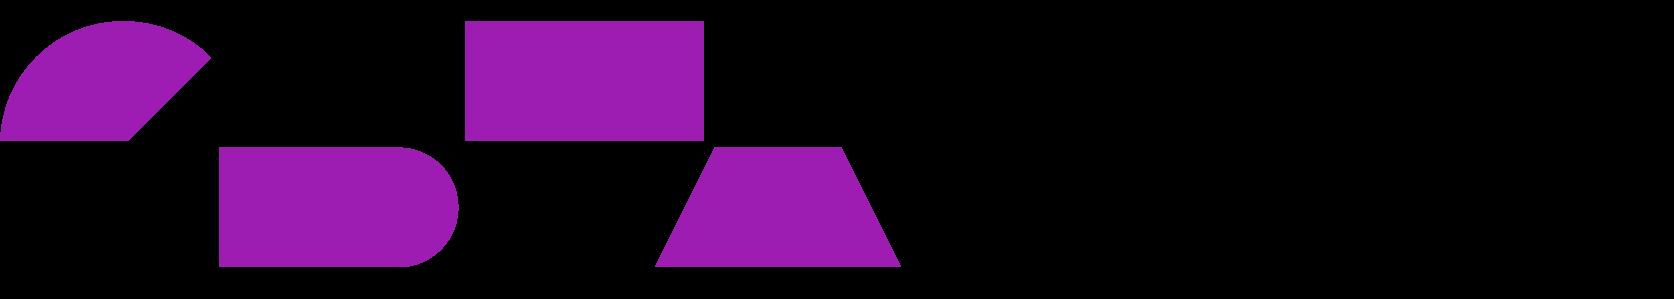 CSTA Logo.png